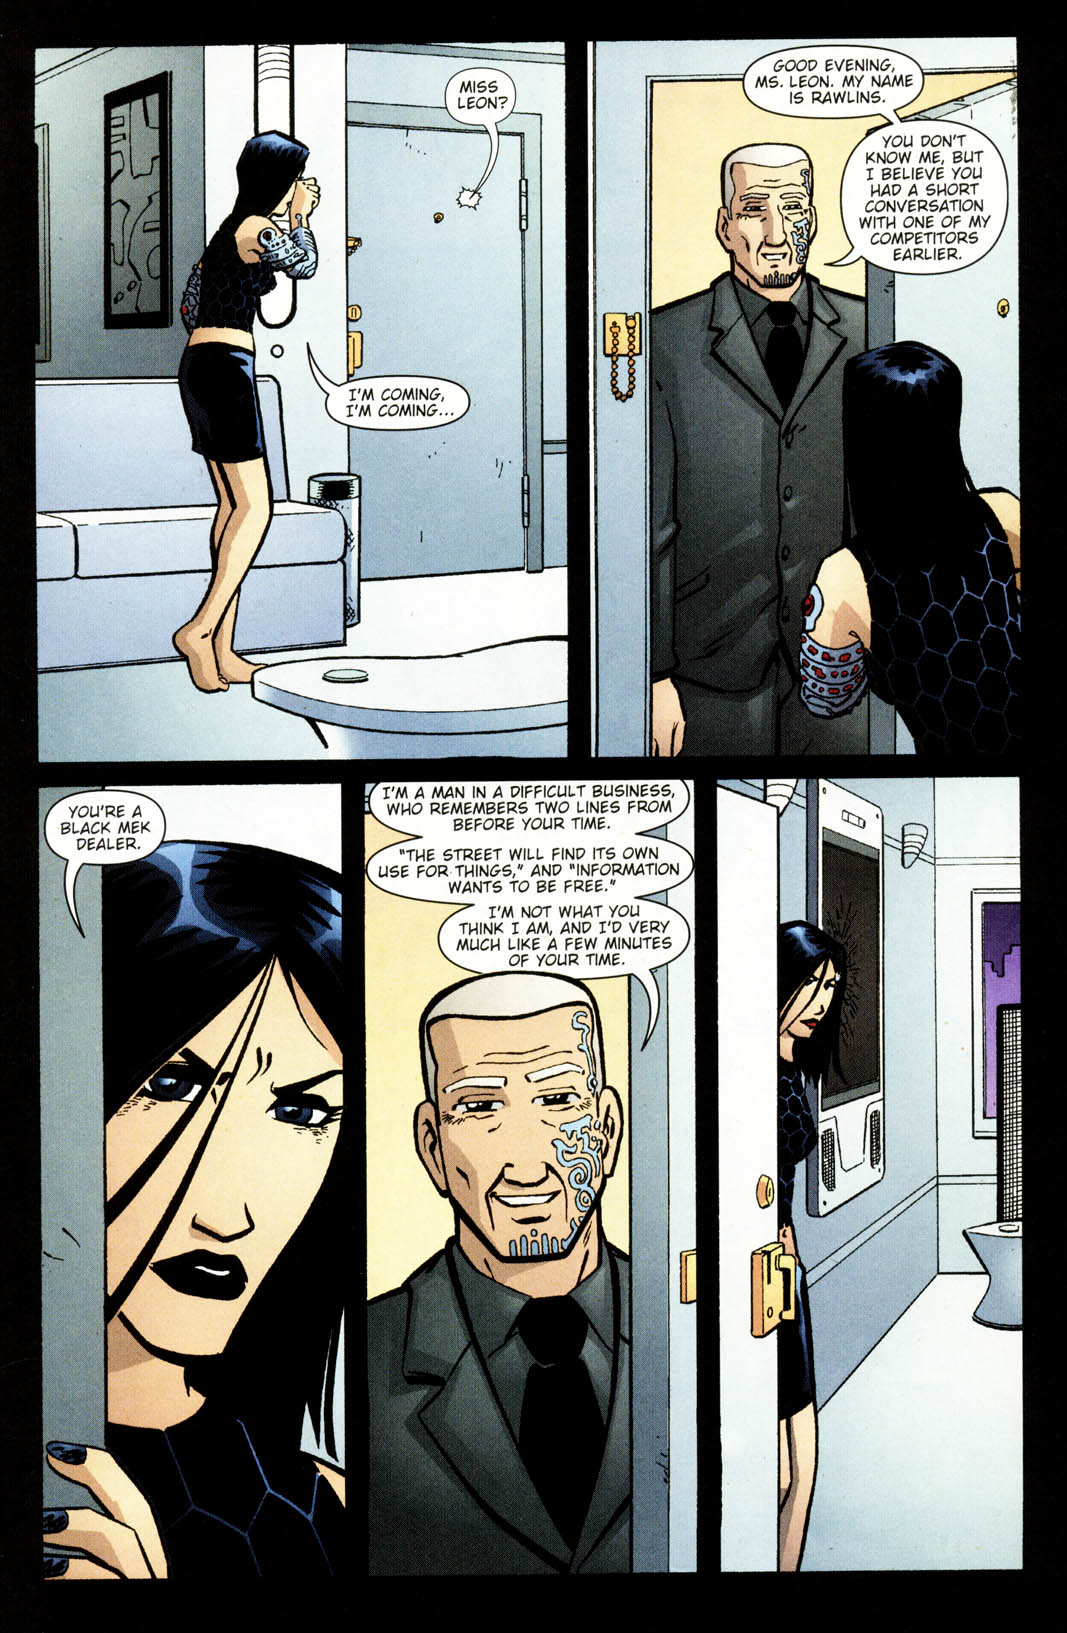 Read online Mek comic -  Issue #2 - 13